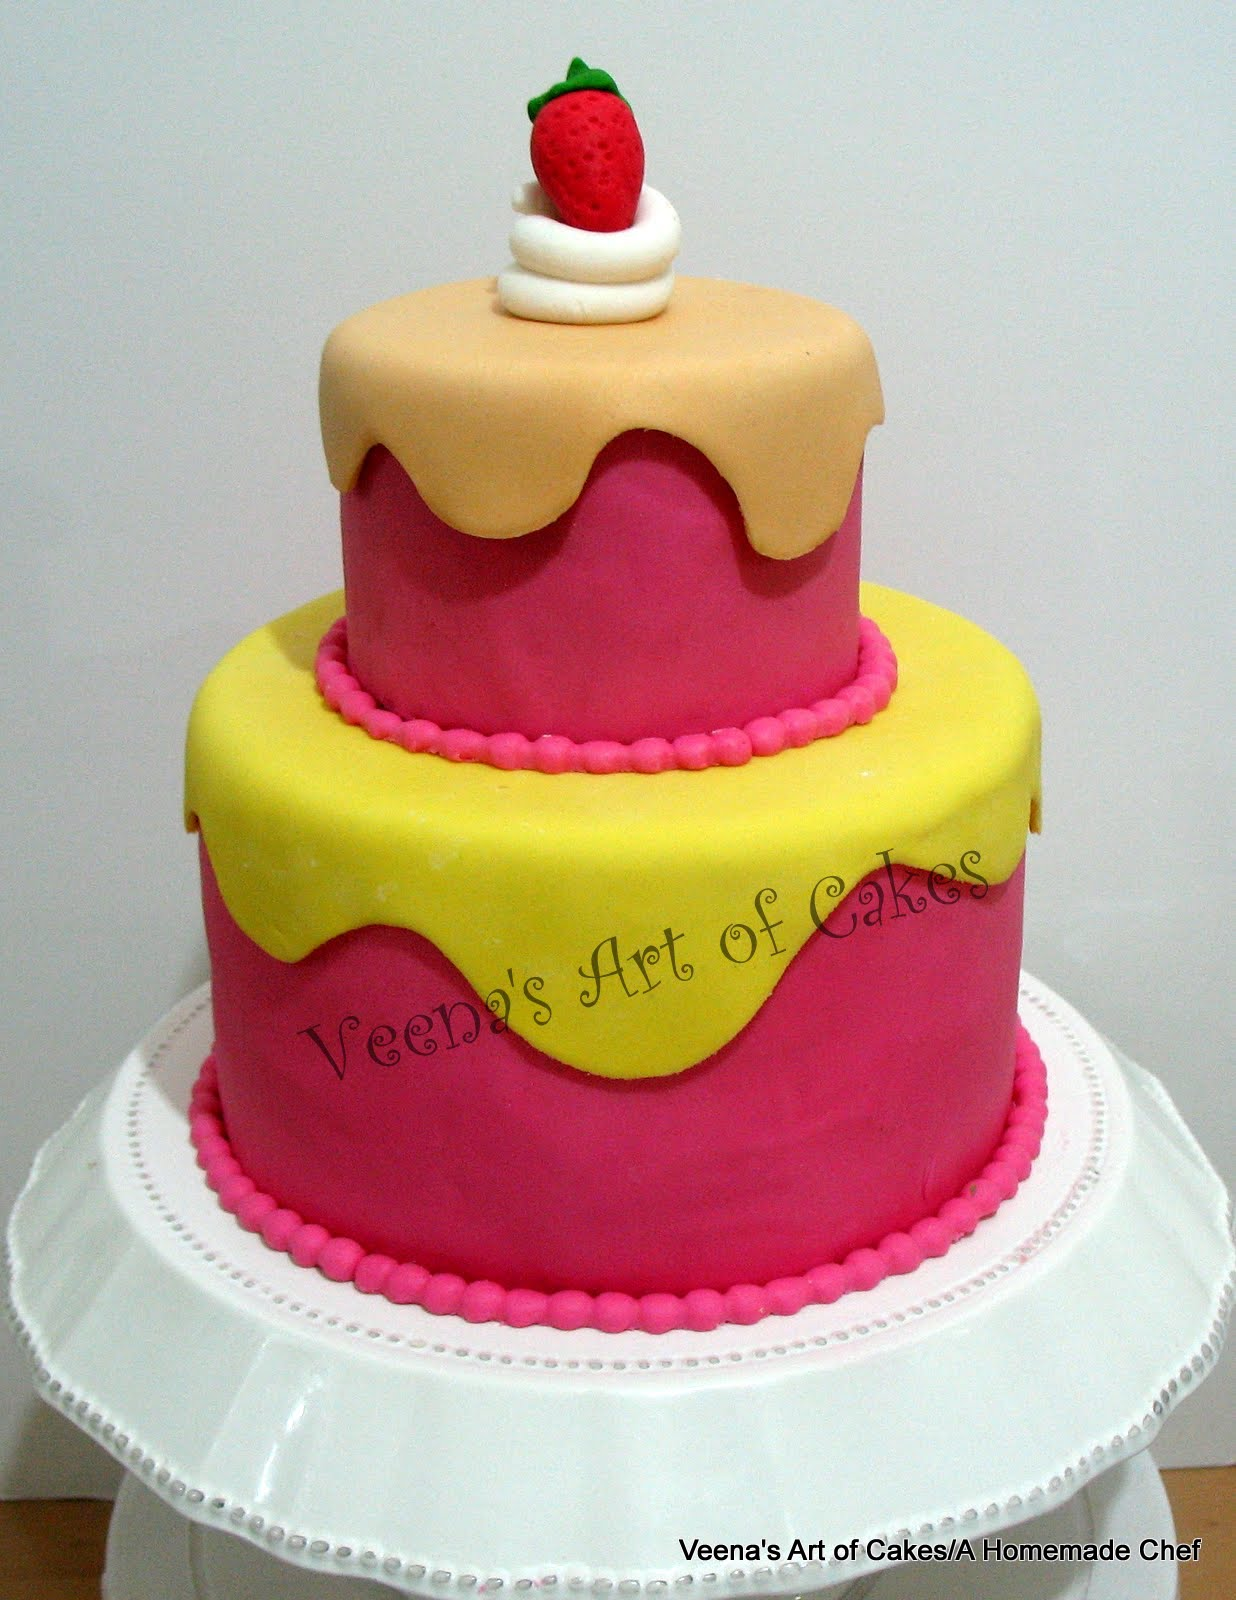 Giant Cupcake plus Drippy Birthday Cake Veena Azmanov